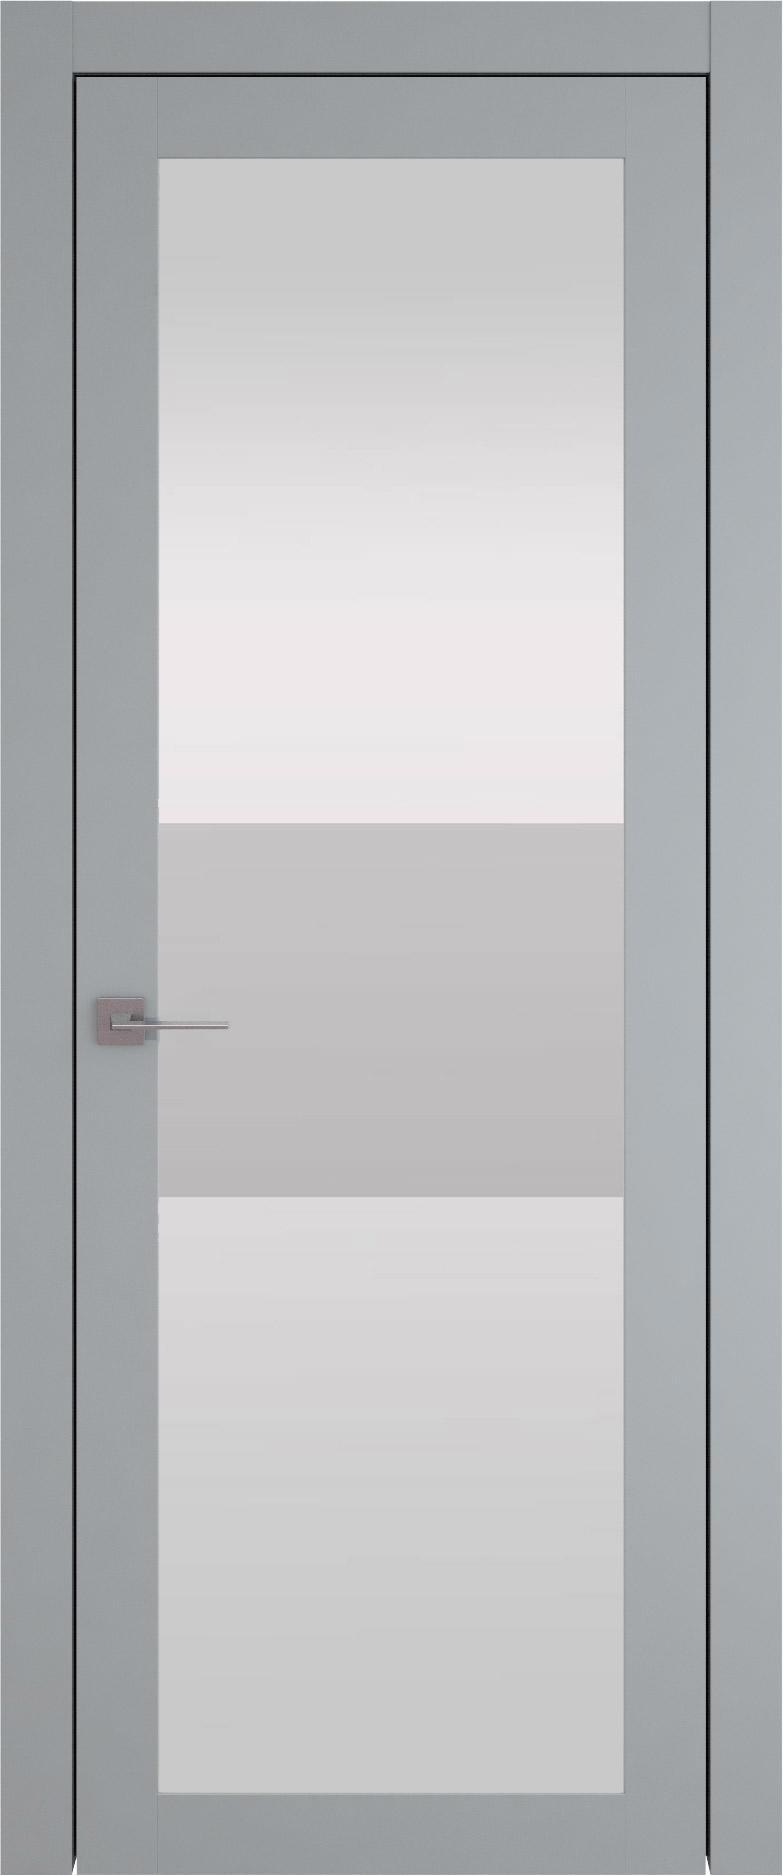 Tivoli З-4 цвет - Серебристо-серая эмаль (RAL 7045) Со стеклом (ДО)